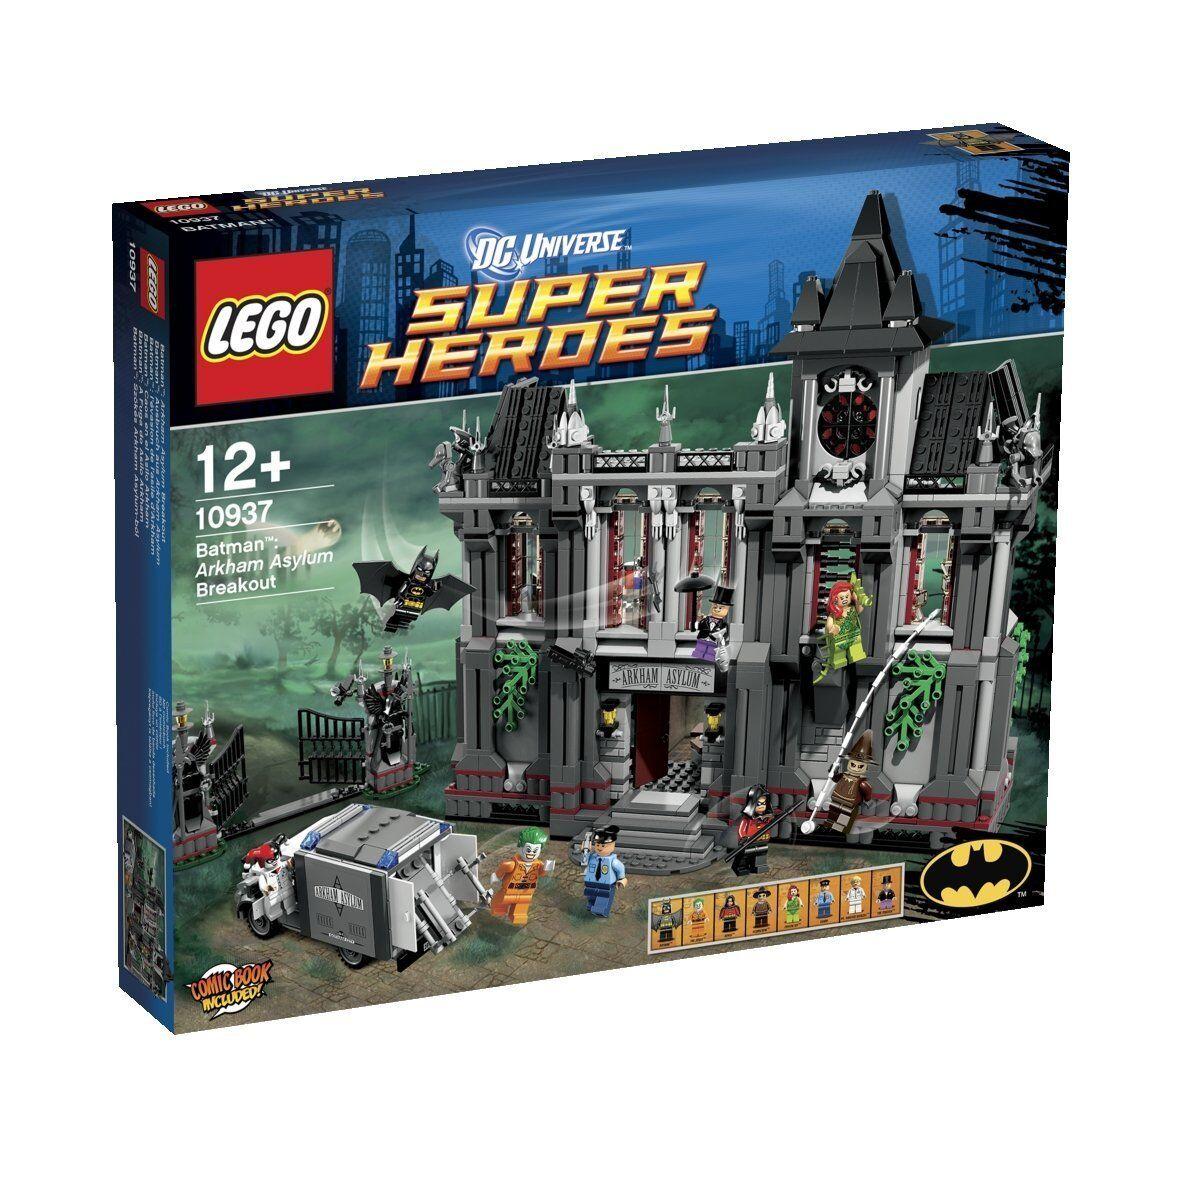 LEGO Super Heroes 10937 - aus Batman Ausbruch aus - Arkham Asylum Breakout NEU MISB 9efa4b